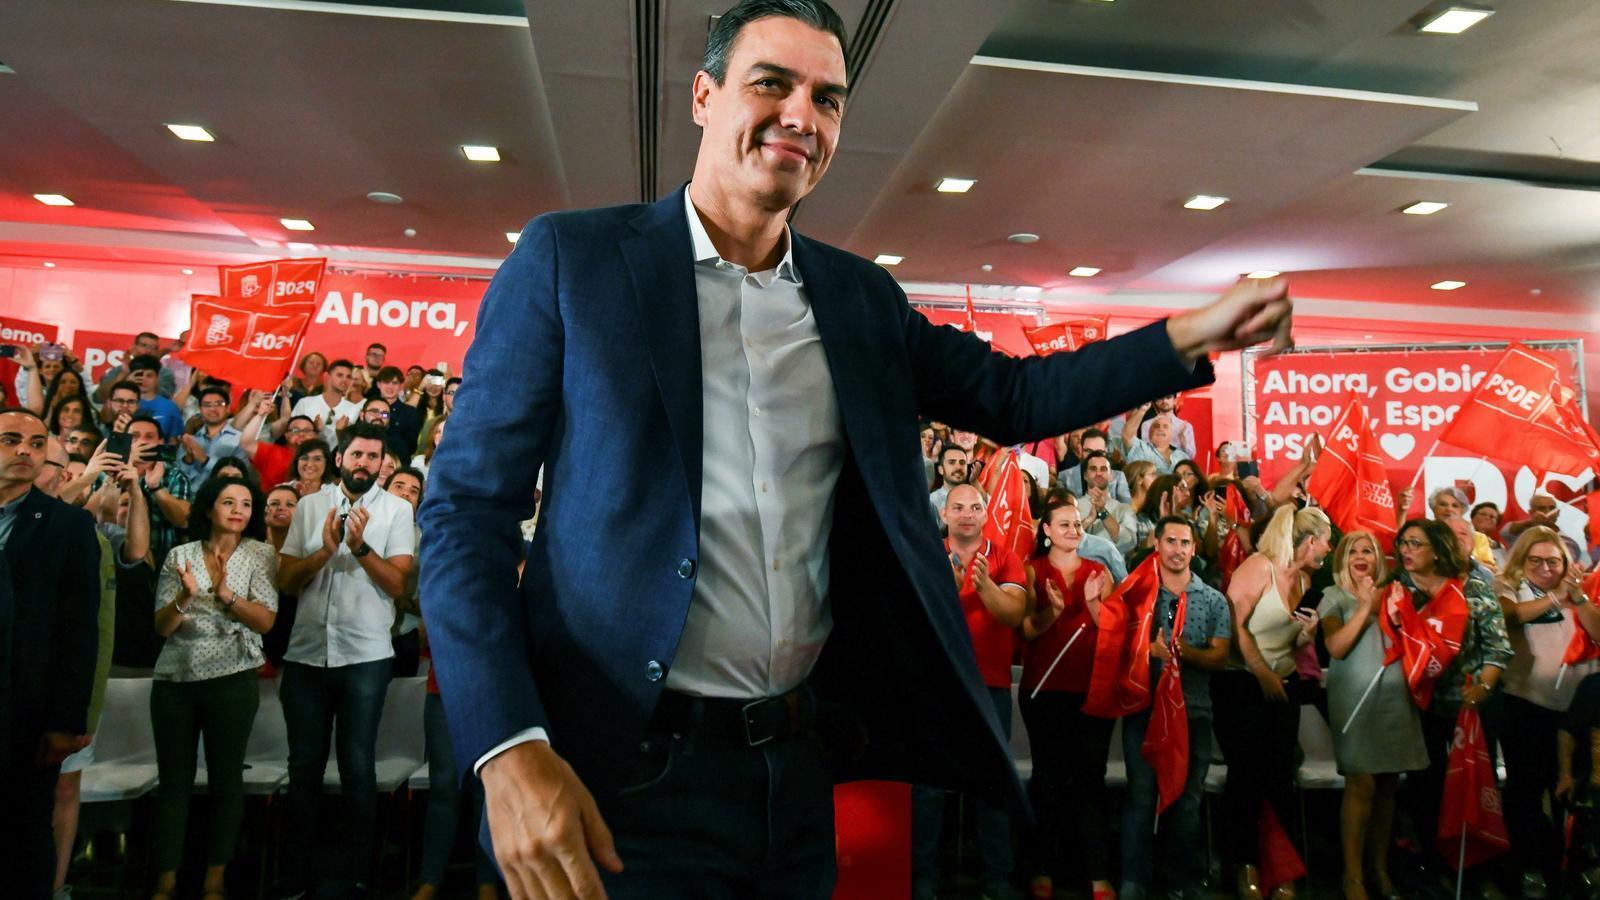 Pedro Sánchez, en un acte a Granada aquest dimarts / EFE